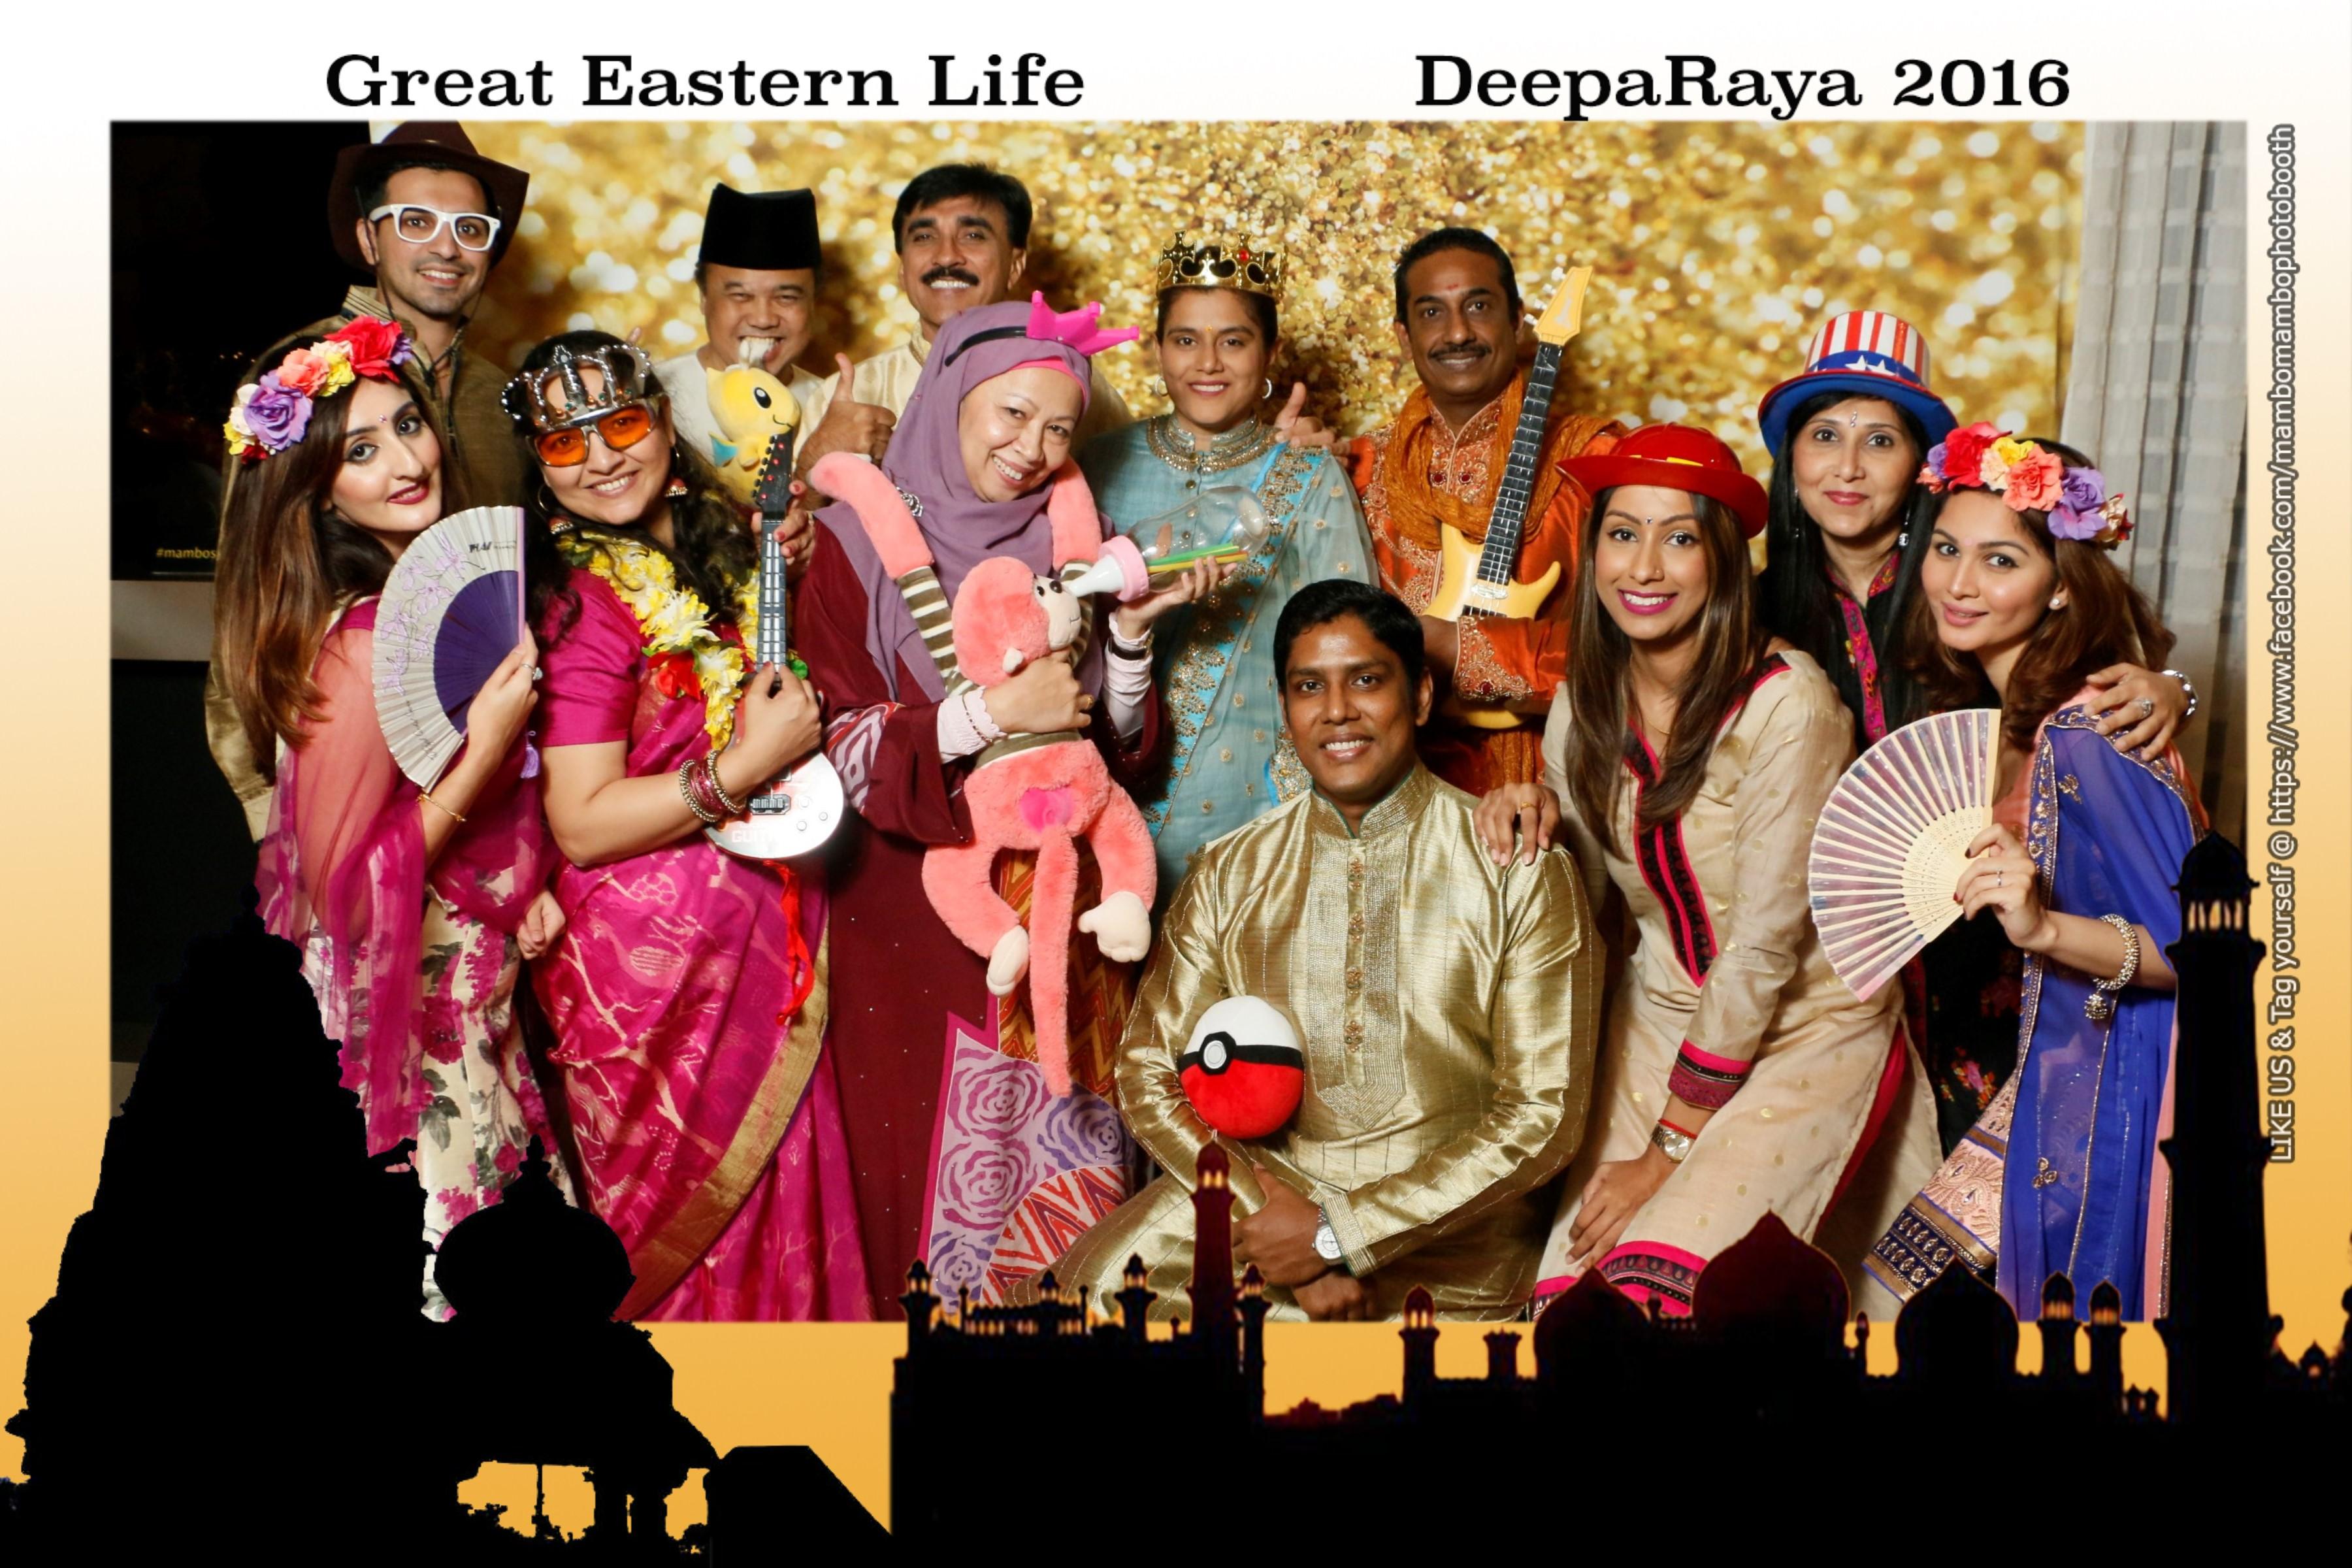 Deeparaya 2016